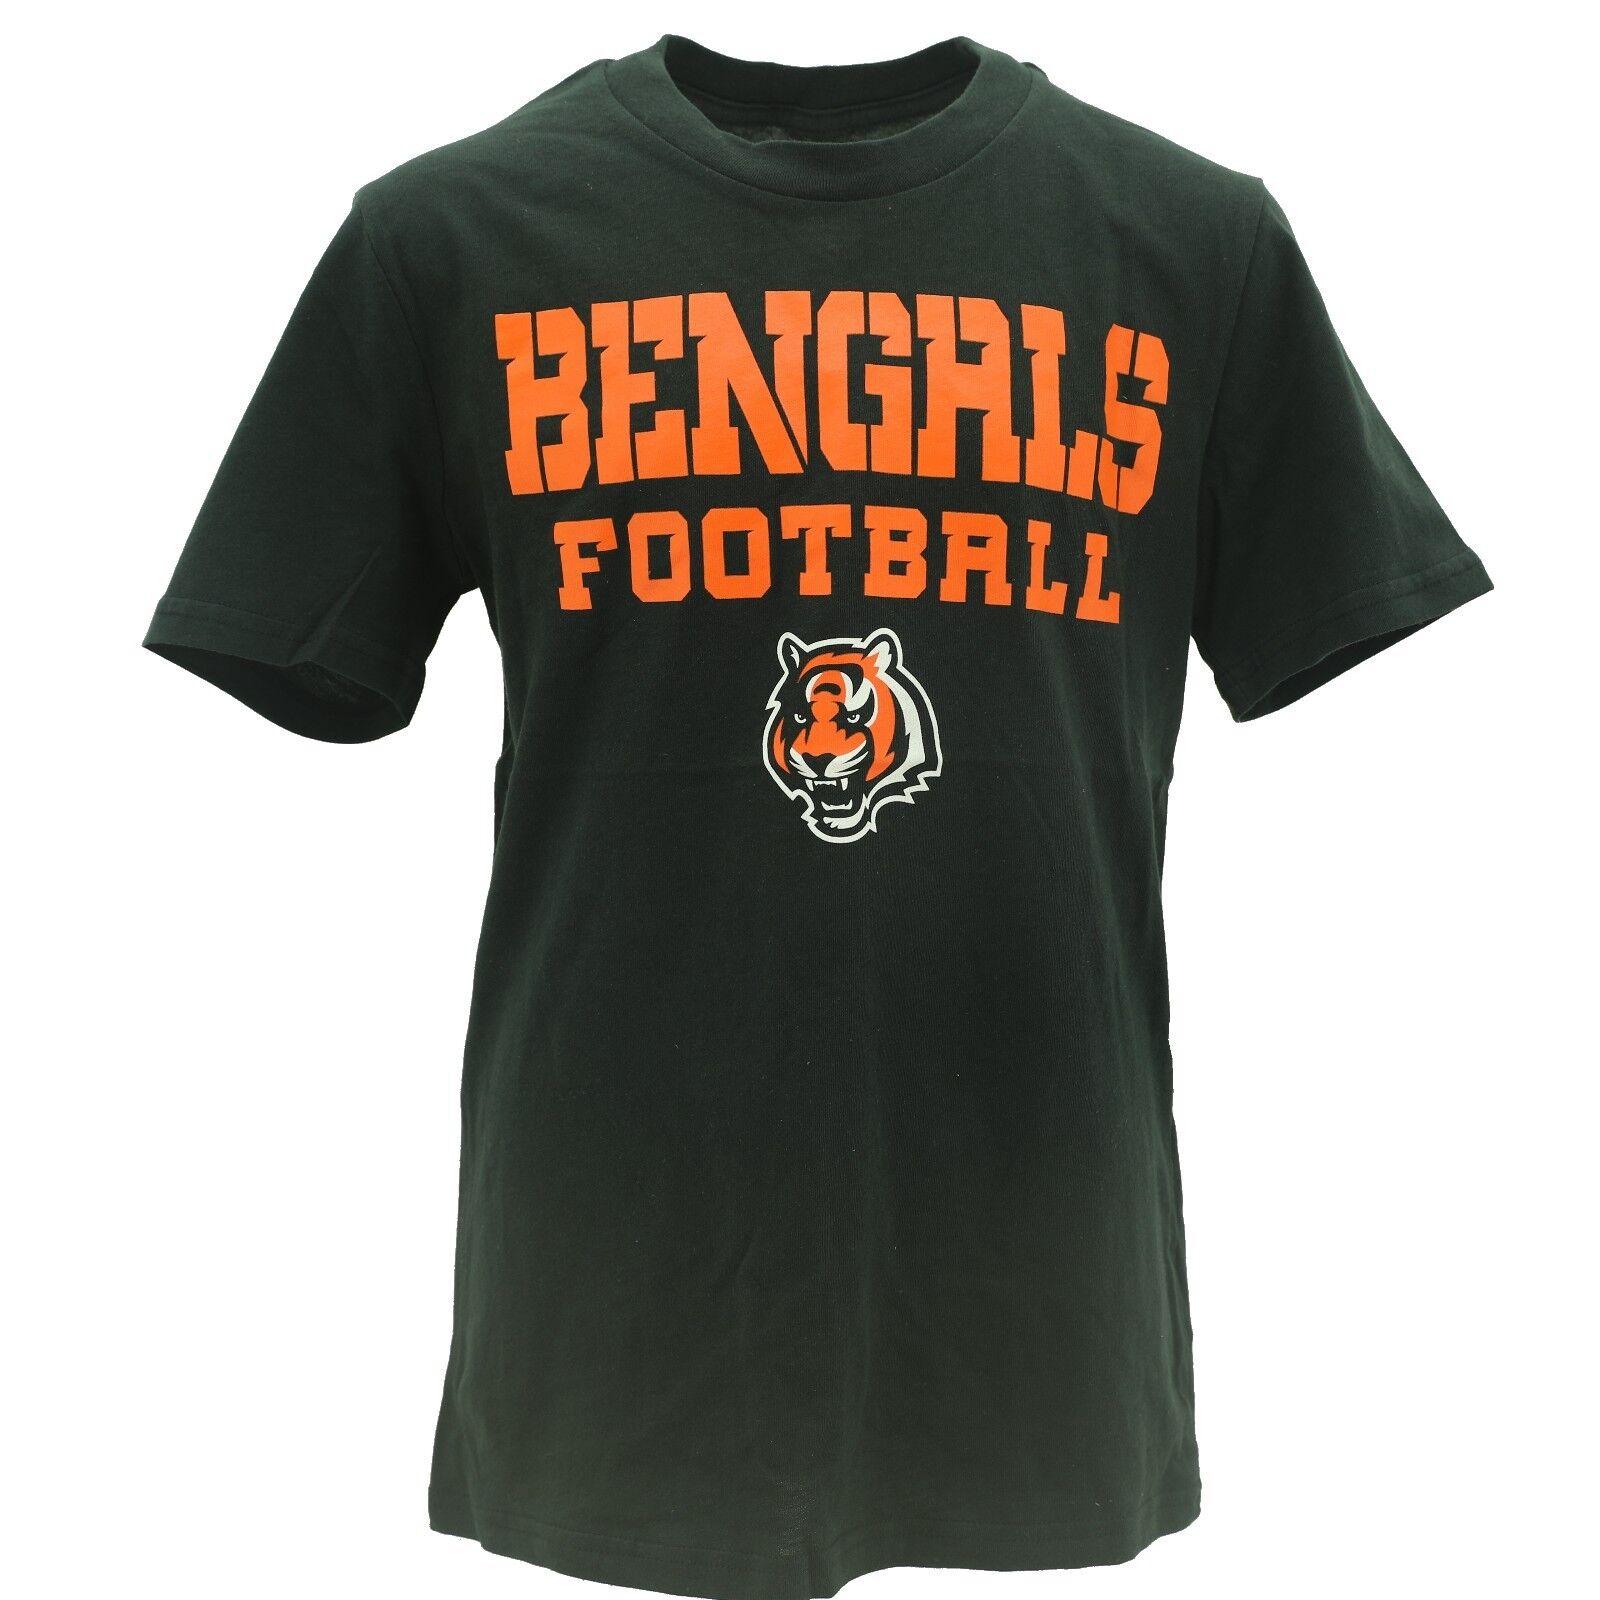 Cincinnati Bengals I Love Watching With Grandpa Kids Toddler T-Shirt